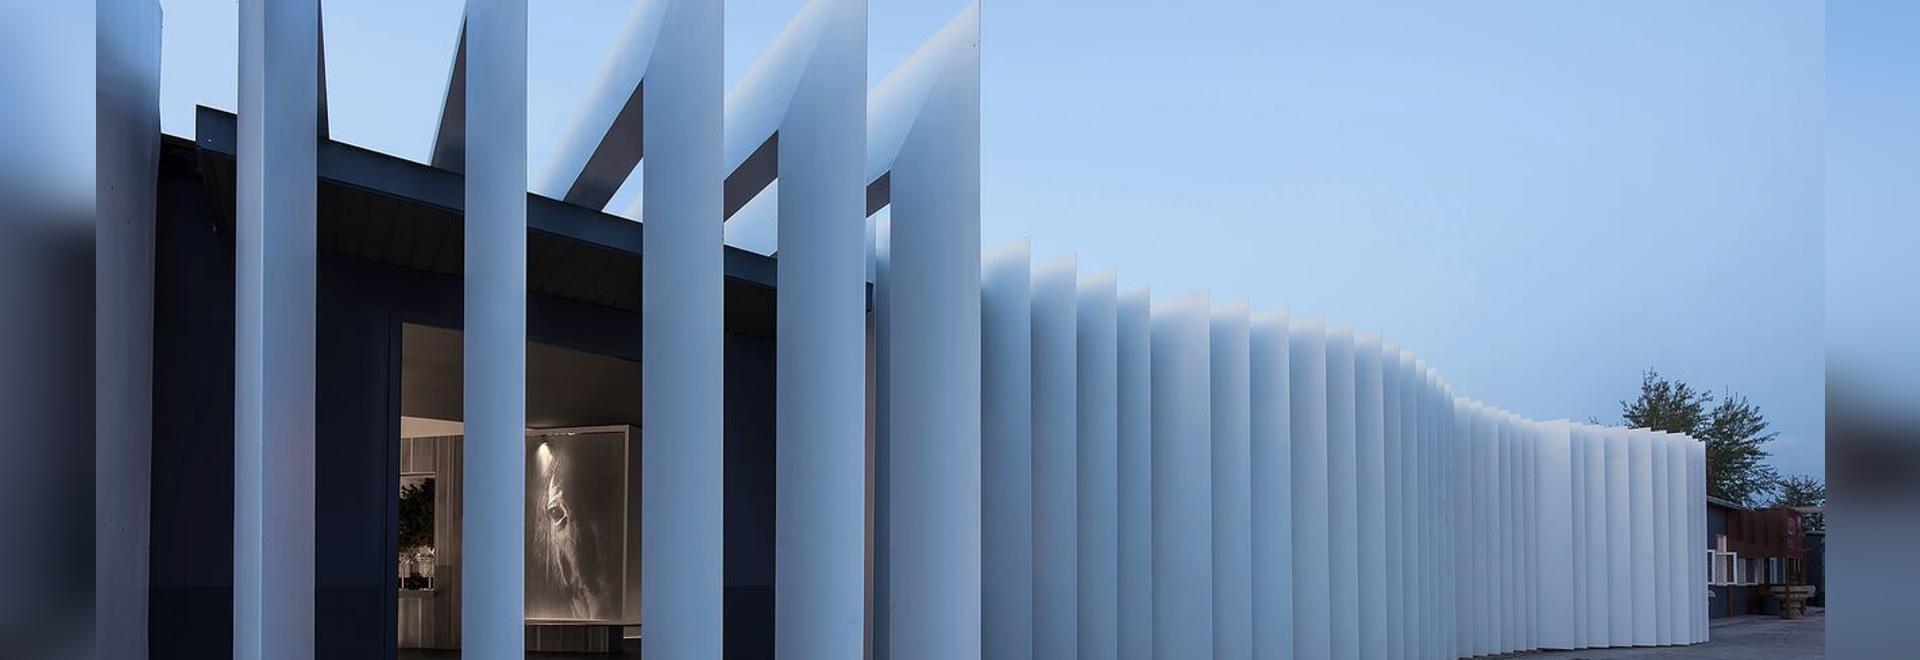 Encounter a beam of light in design